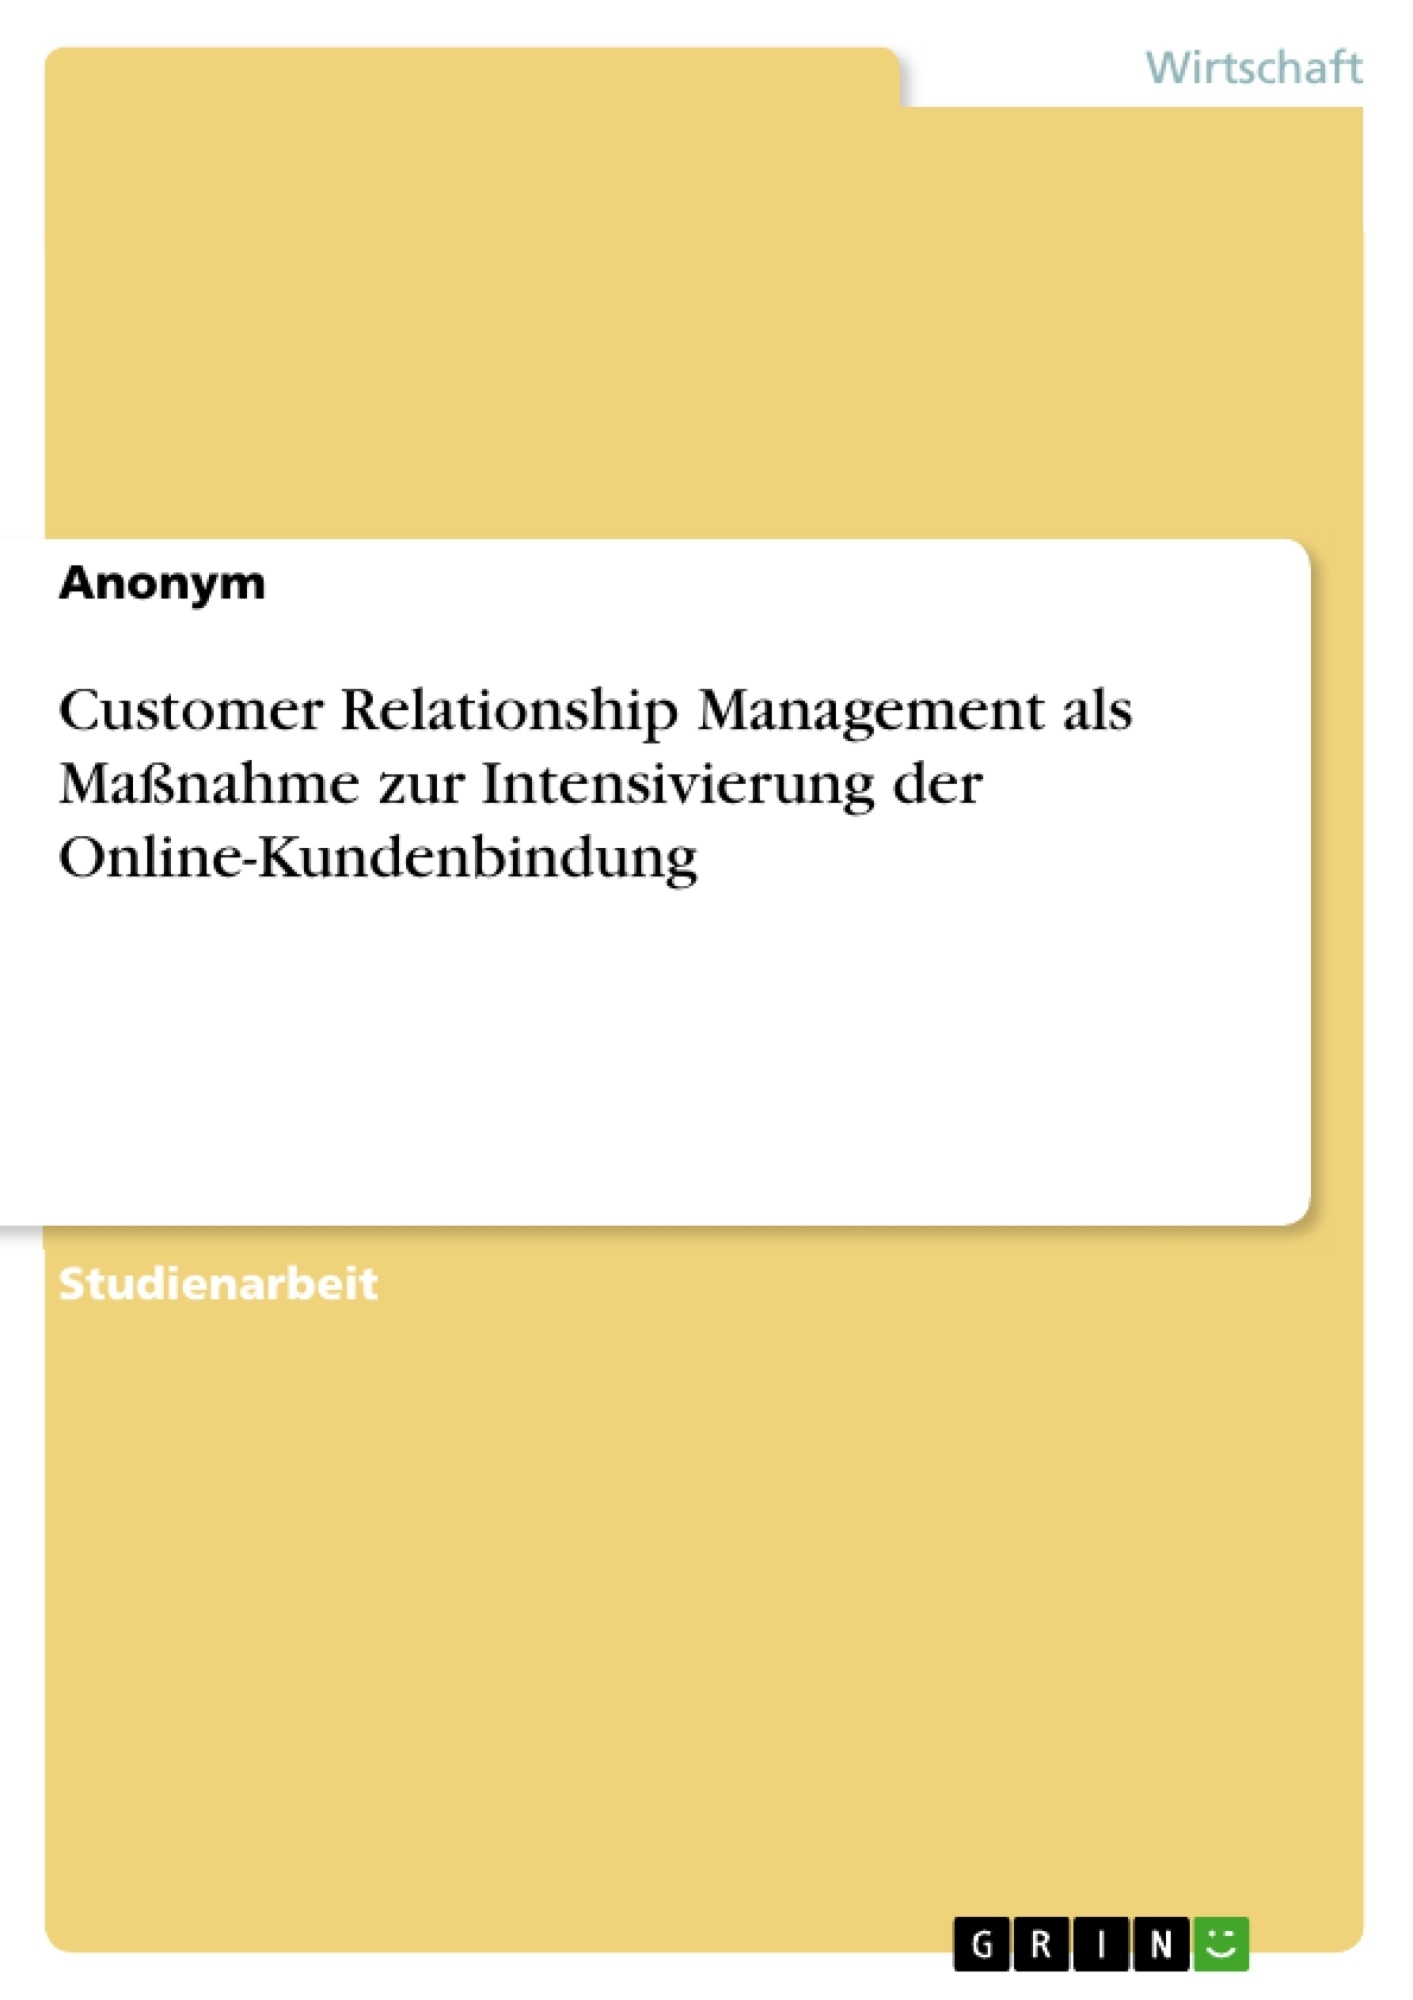 Titel: Customer Relationship Management als Maßnahme zur Intensivierung der Online-Kundenbindung